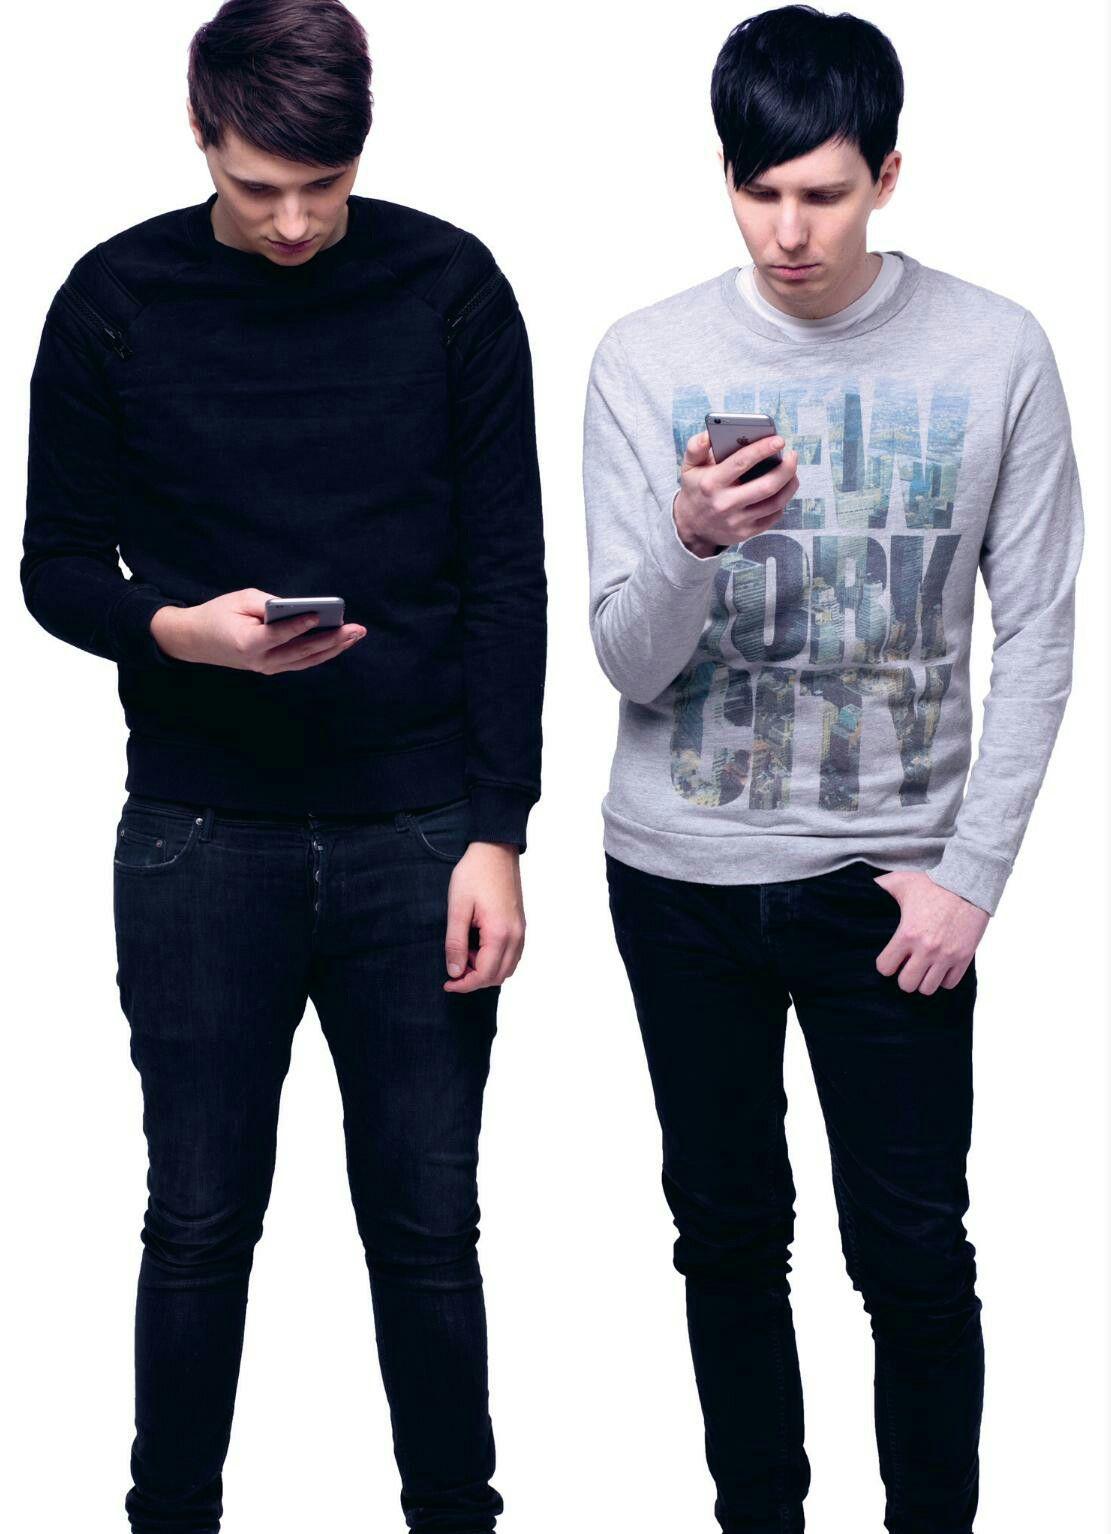 Phil Lester Dan And YouTube Howell